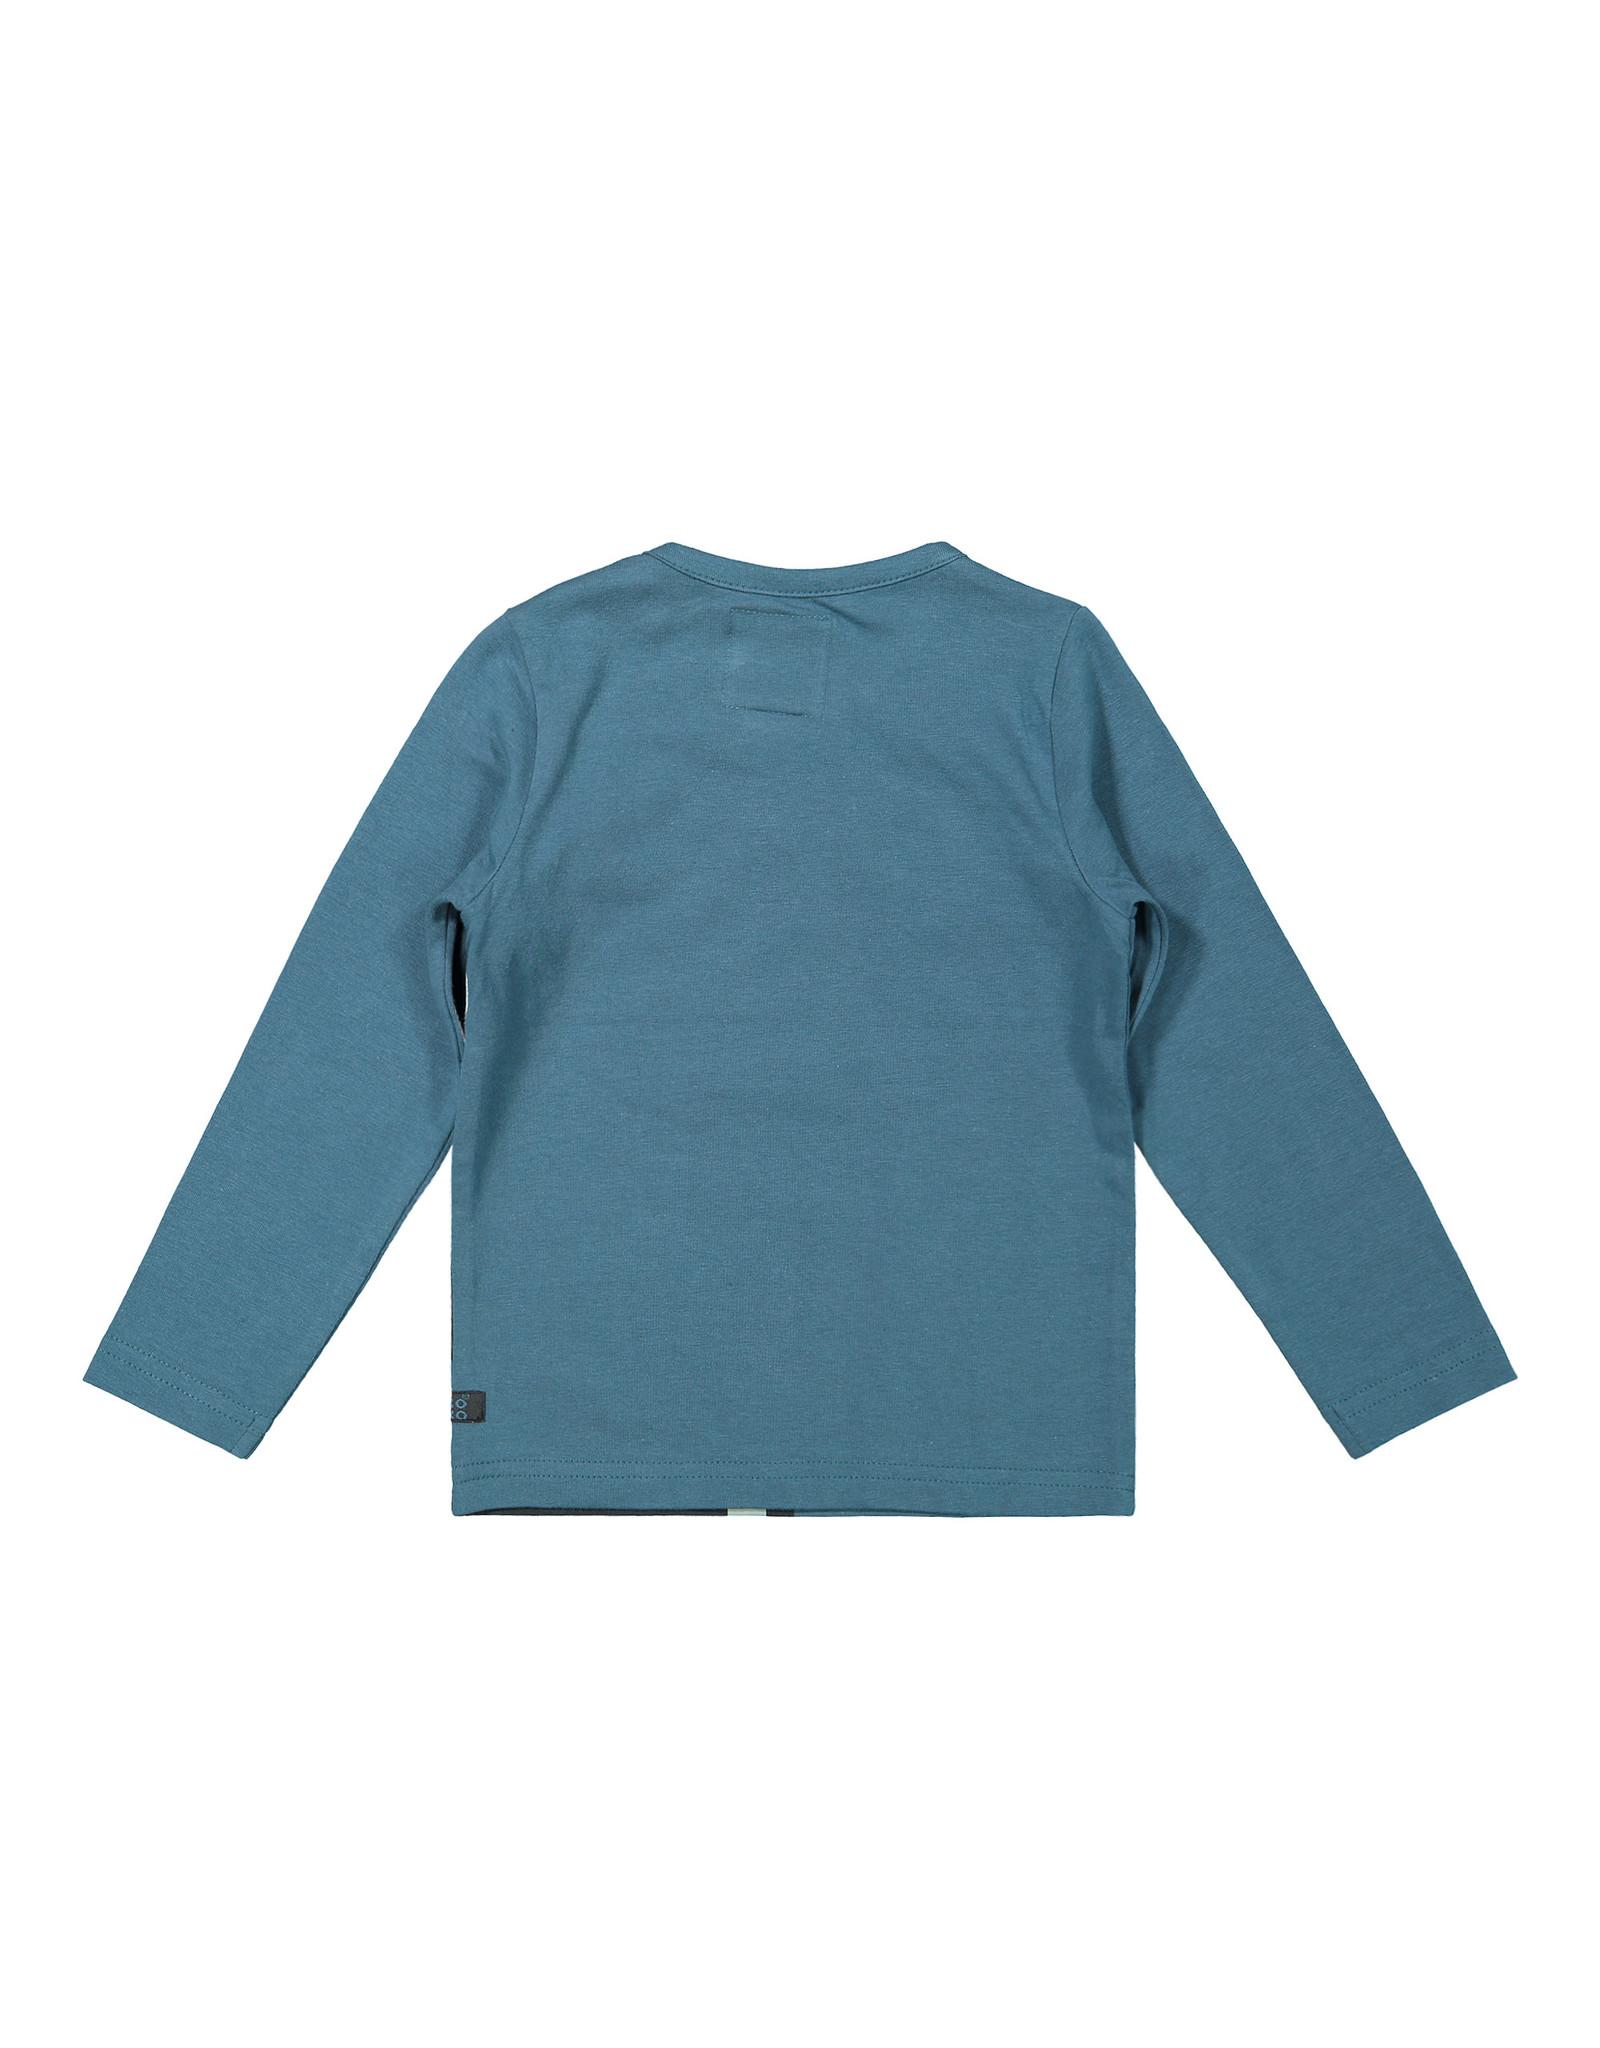 Koko Noko Boys T-shirt ls Petrol + dark grey